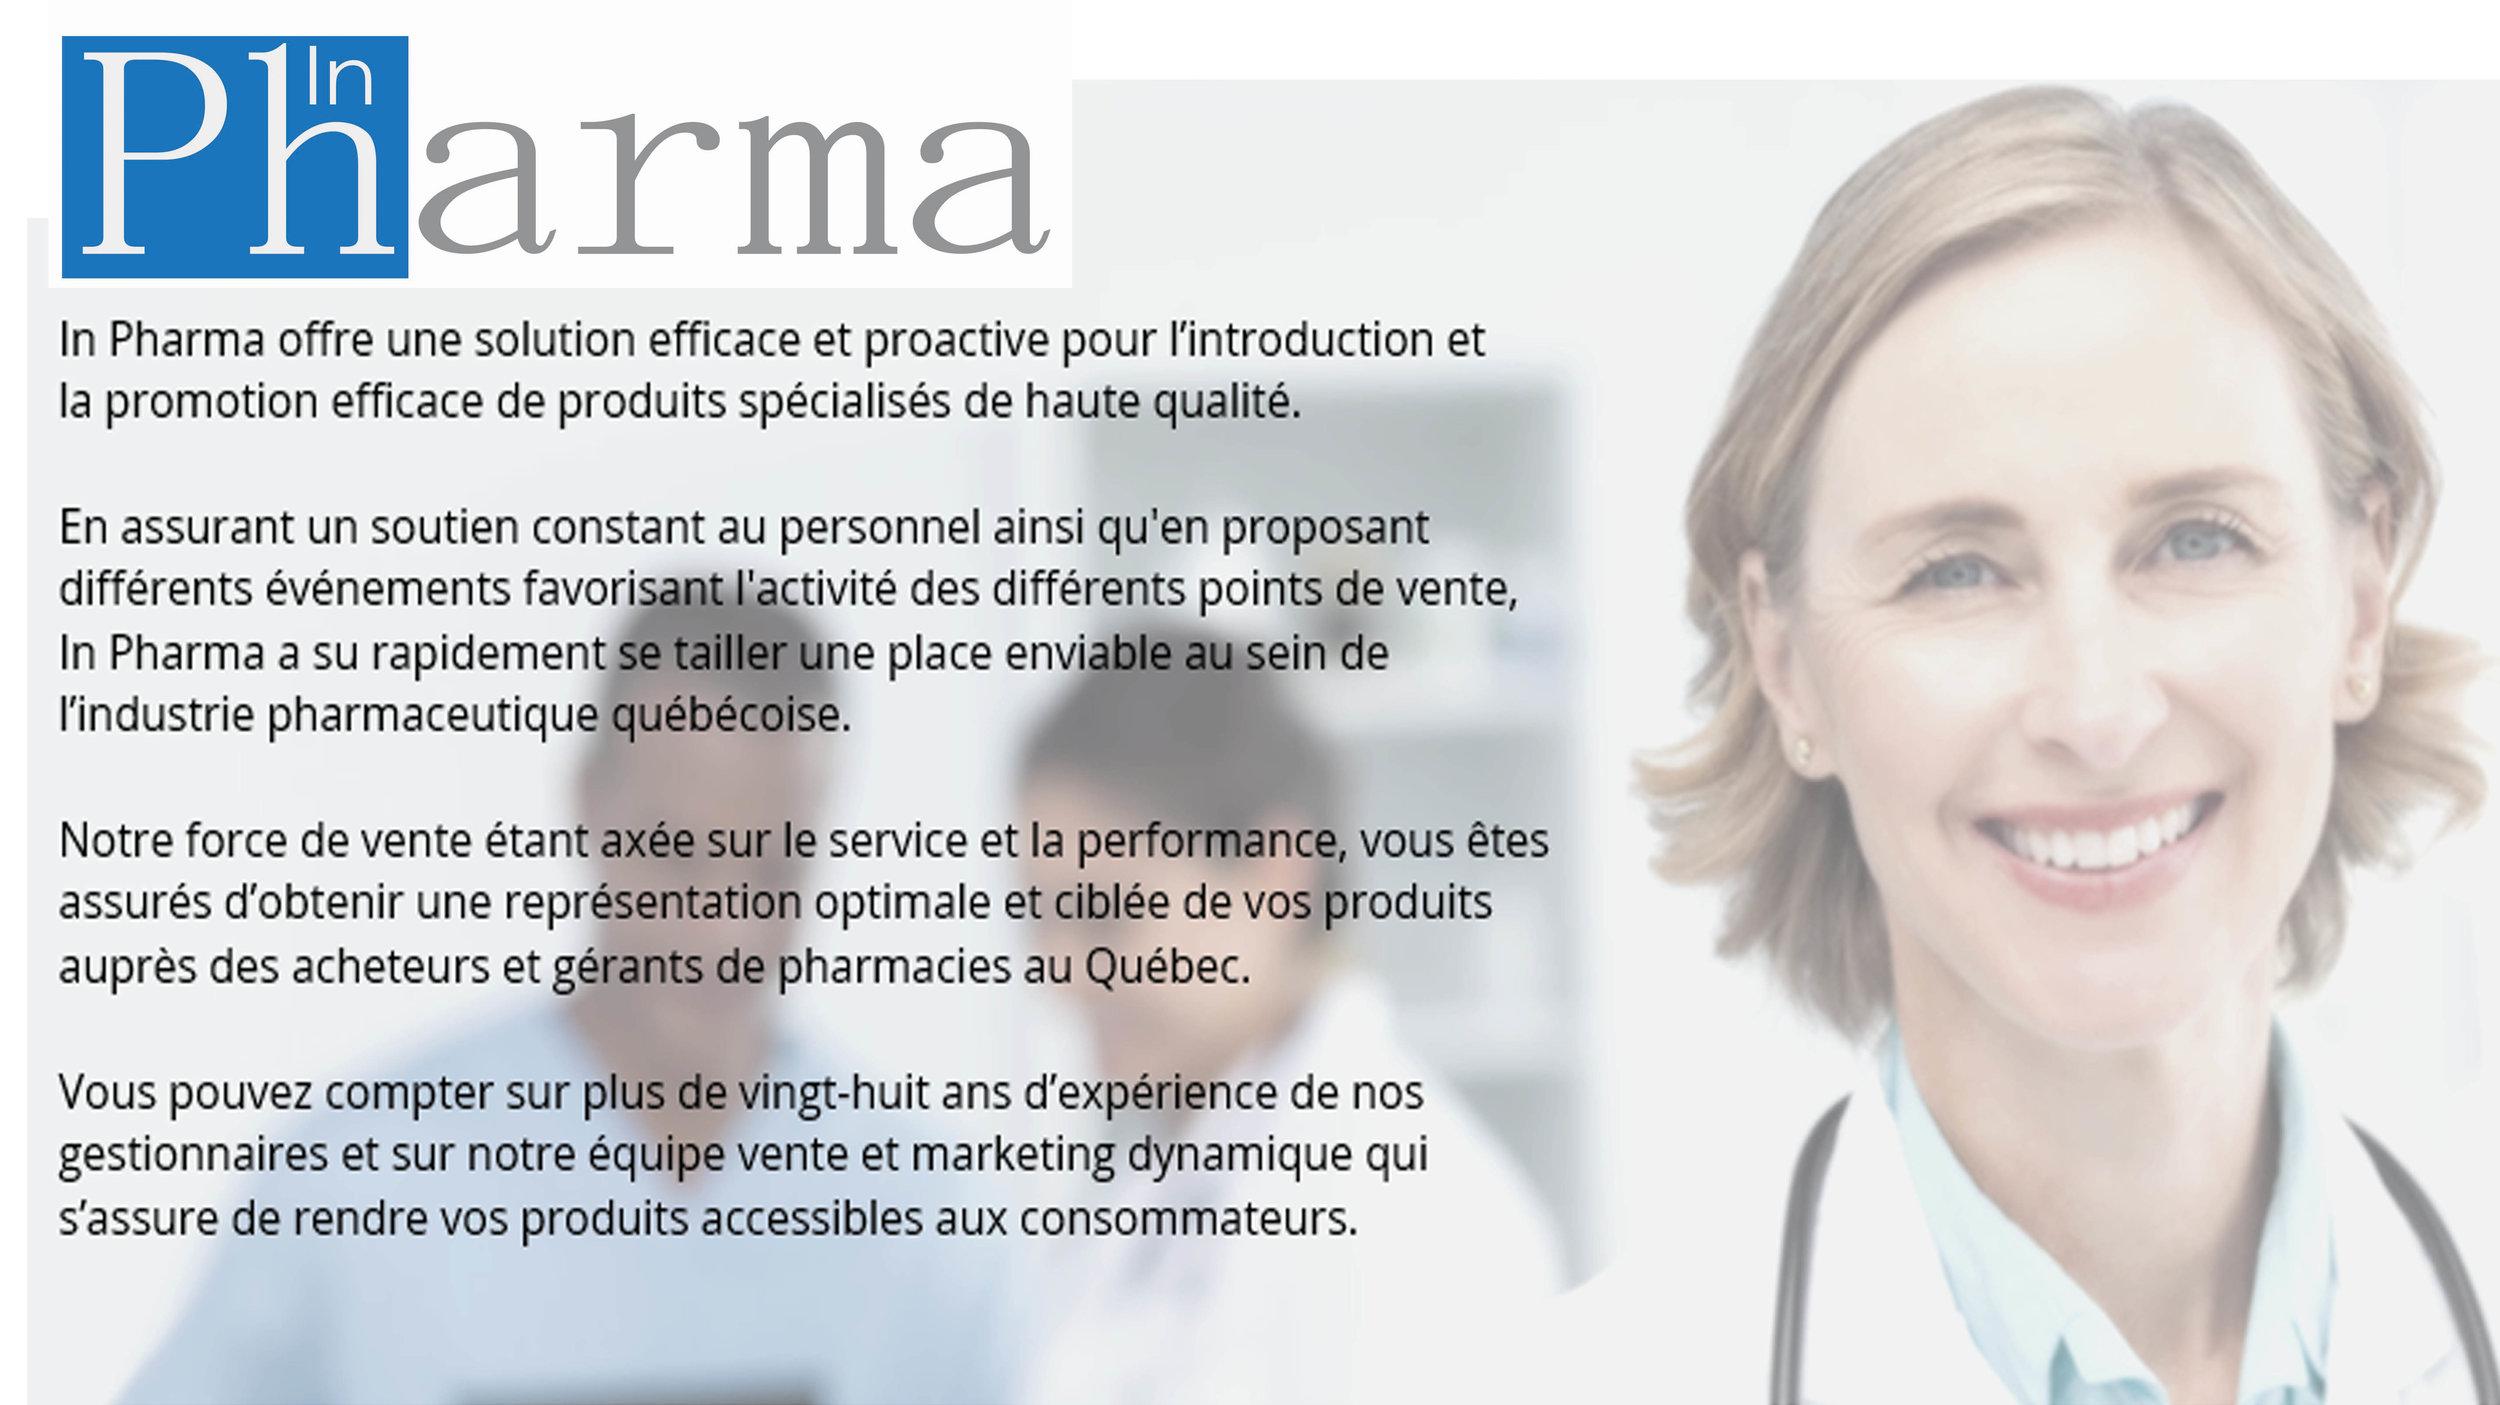 In Pharma.jpg